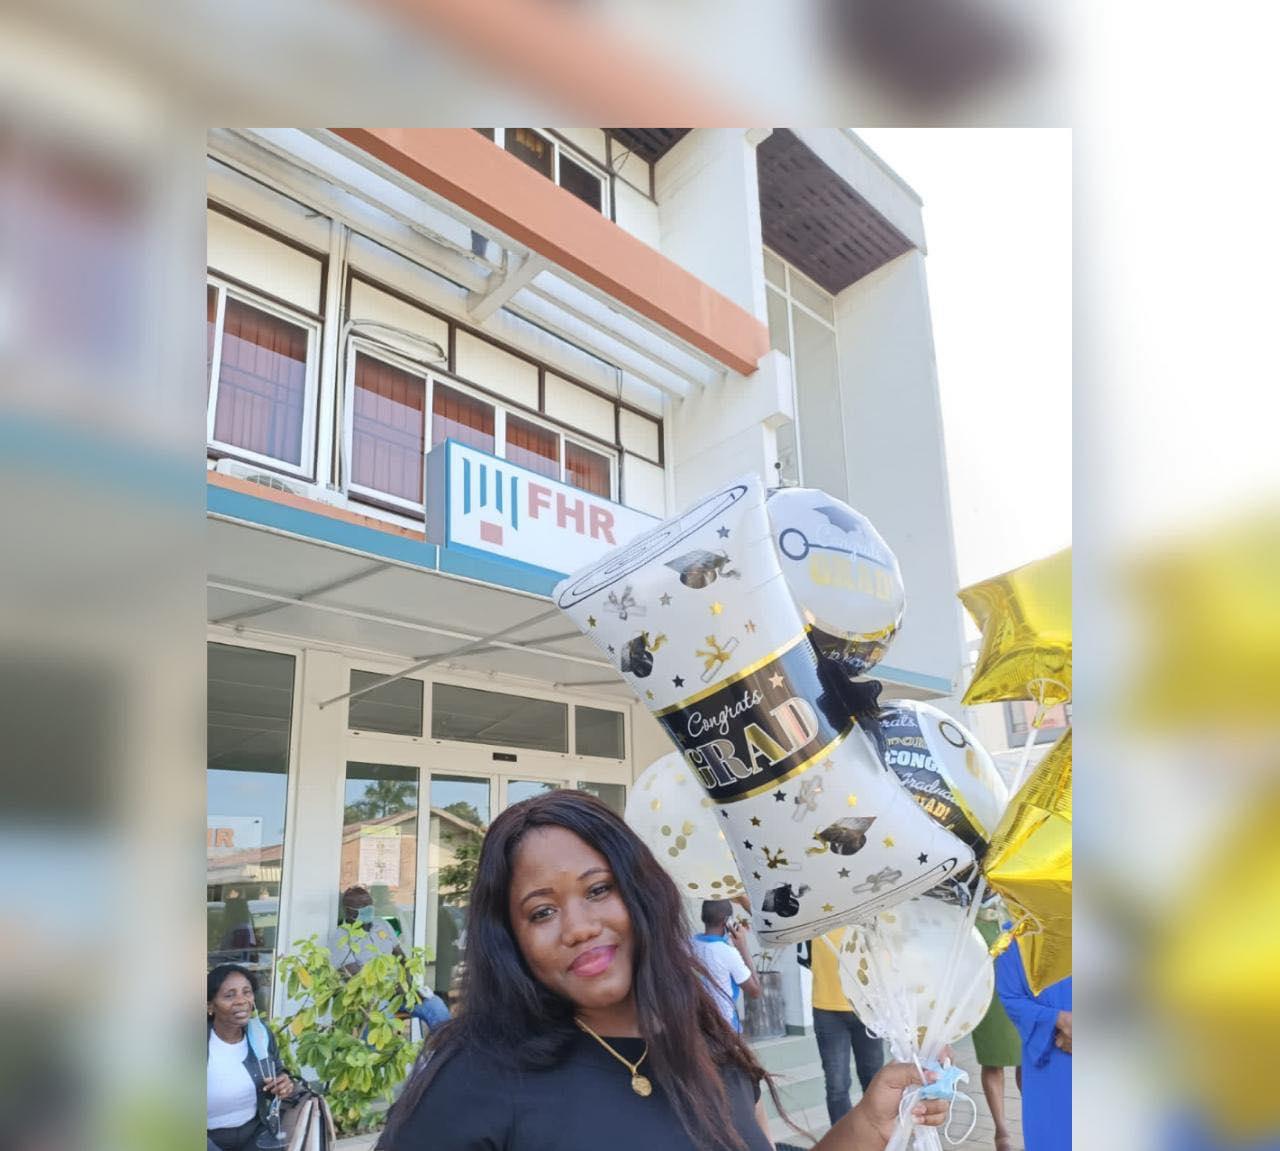 tienermoeder Suriname Paramaribo geslaagd Charlin Groenewoud 2